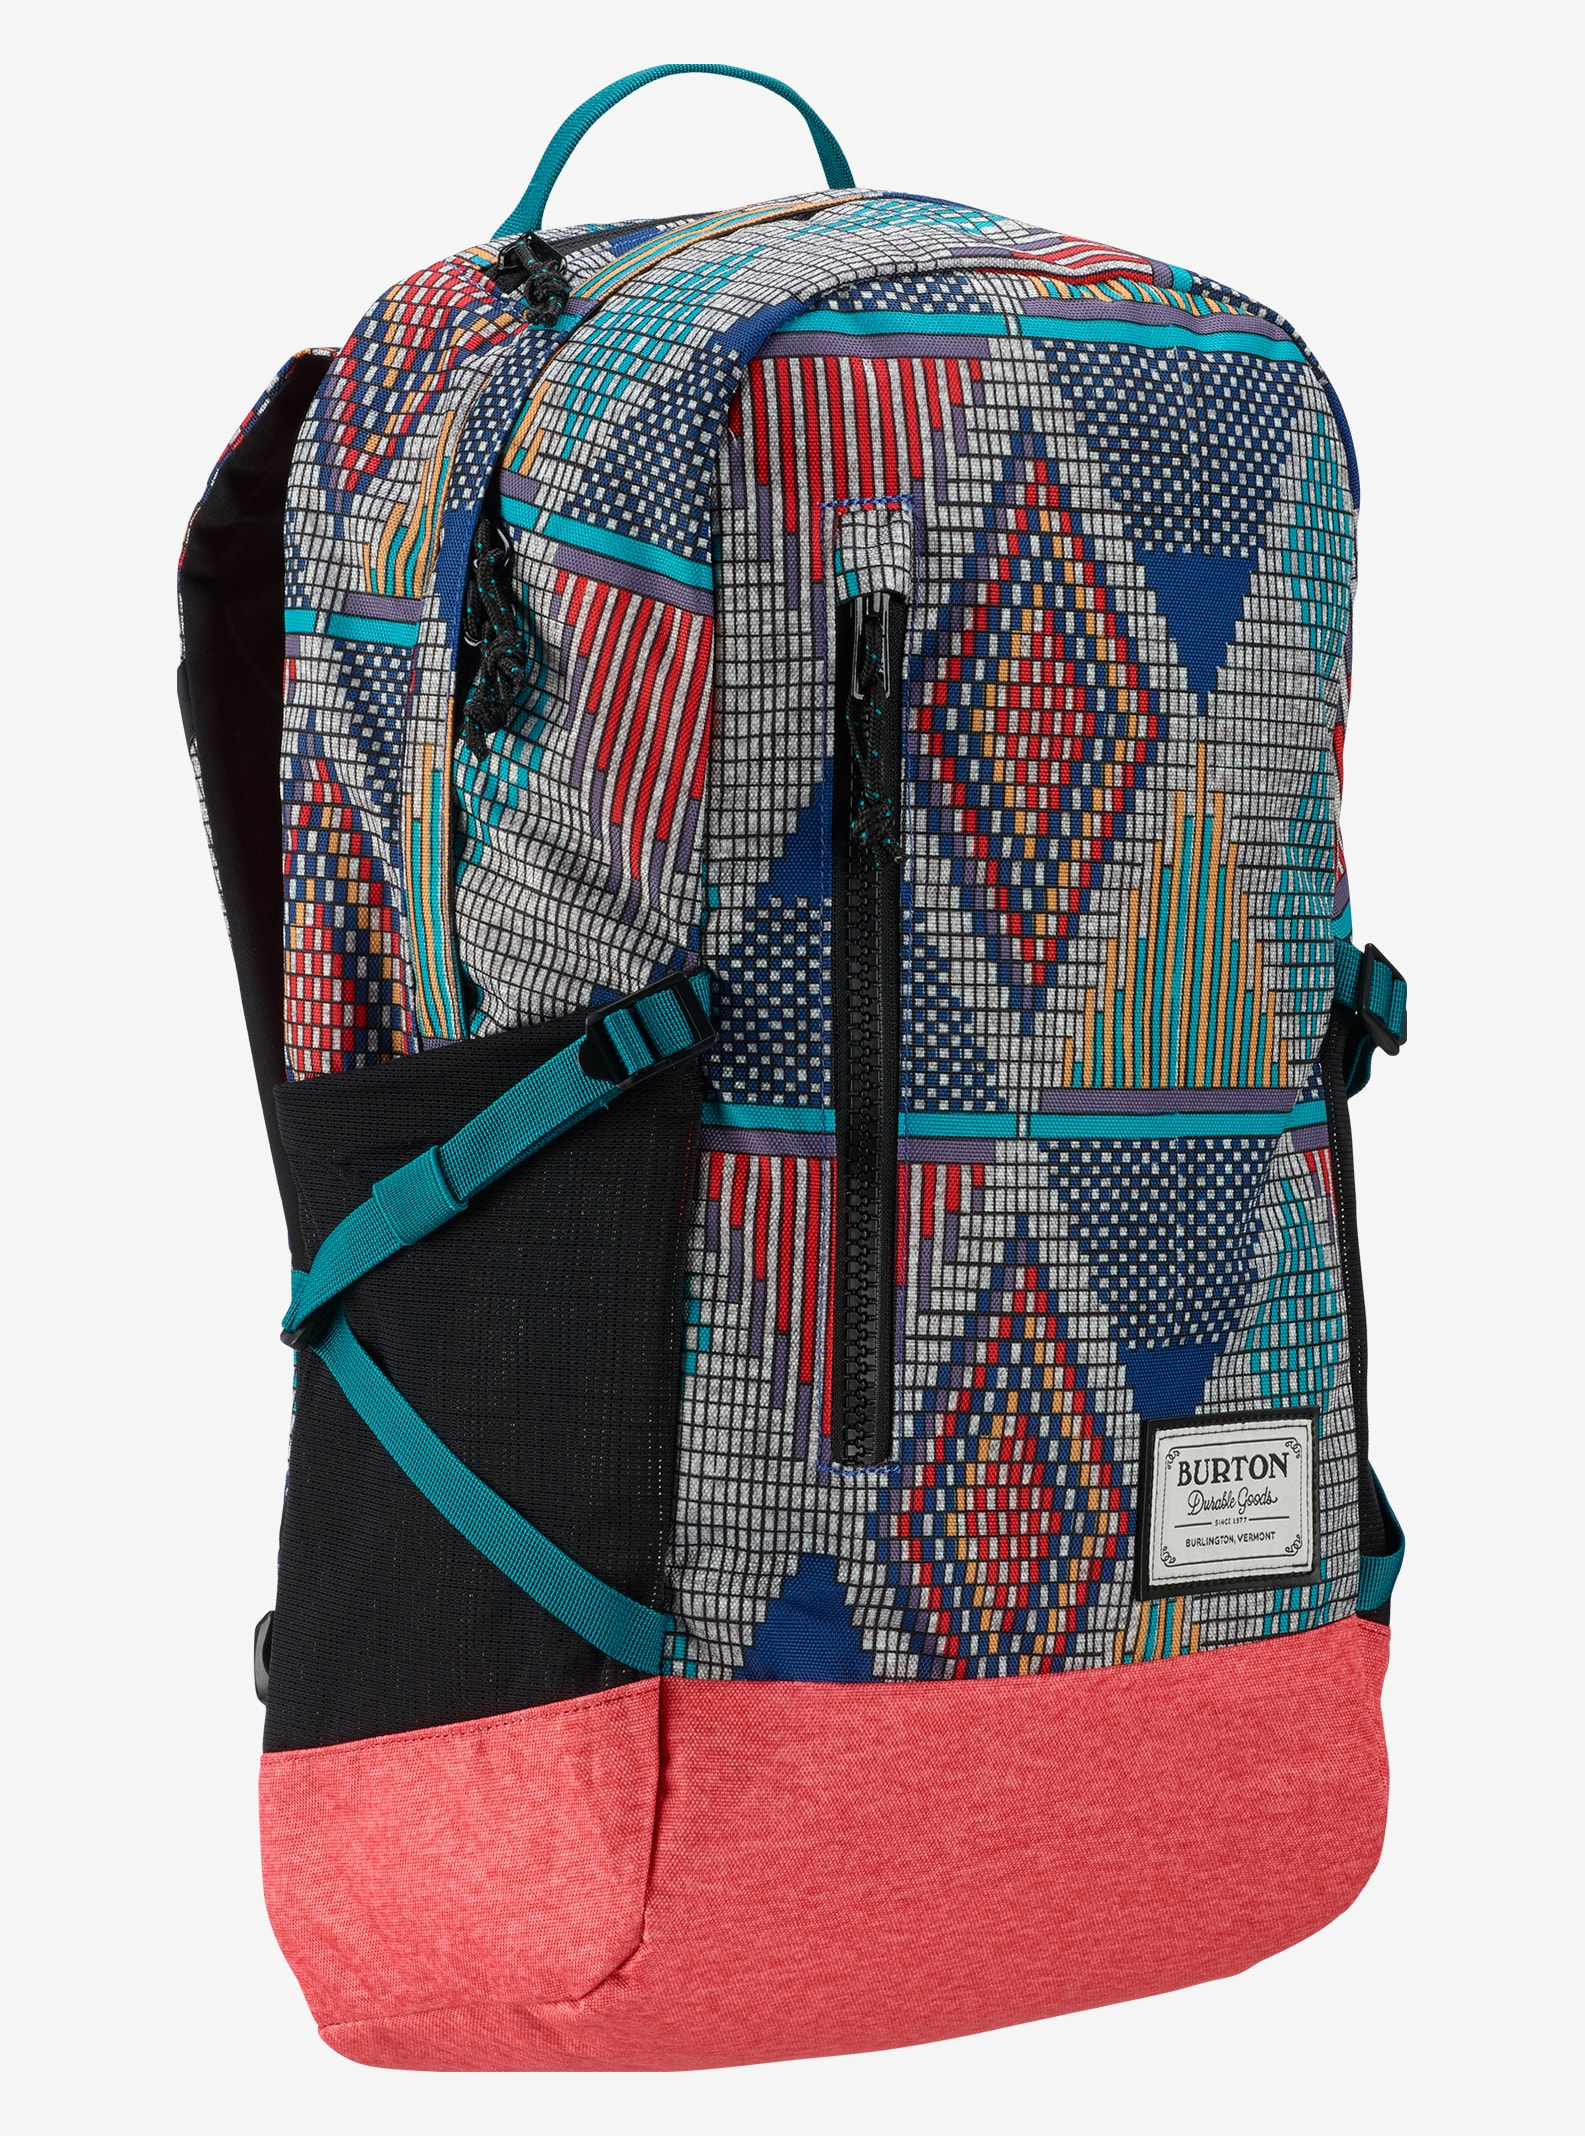 Burton Women's Prospect Backpack shown in De Geo Print